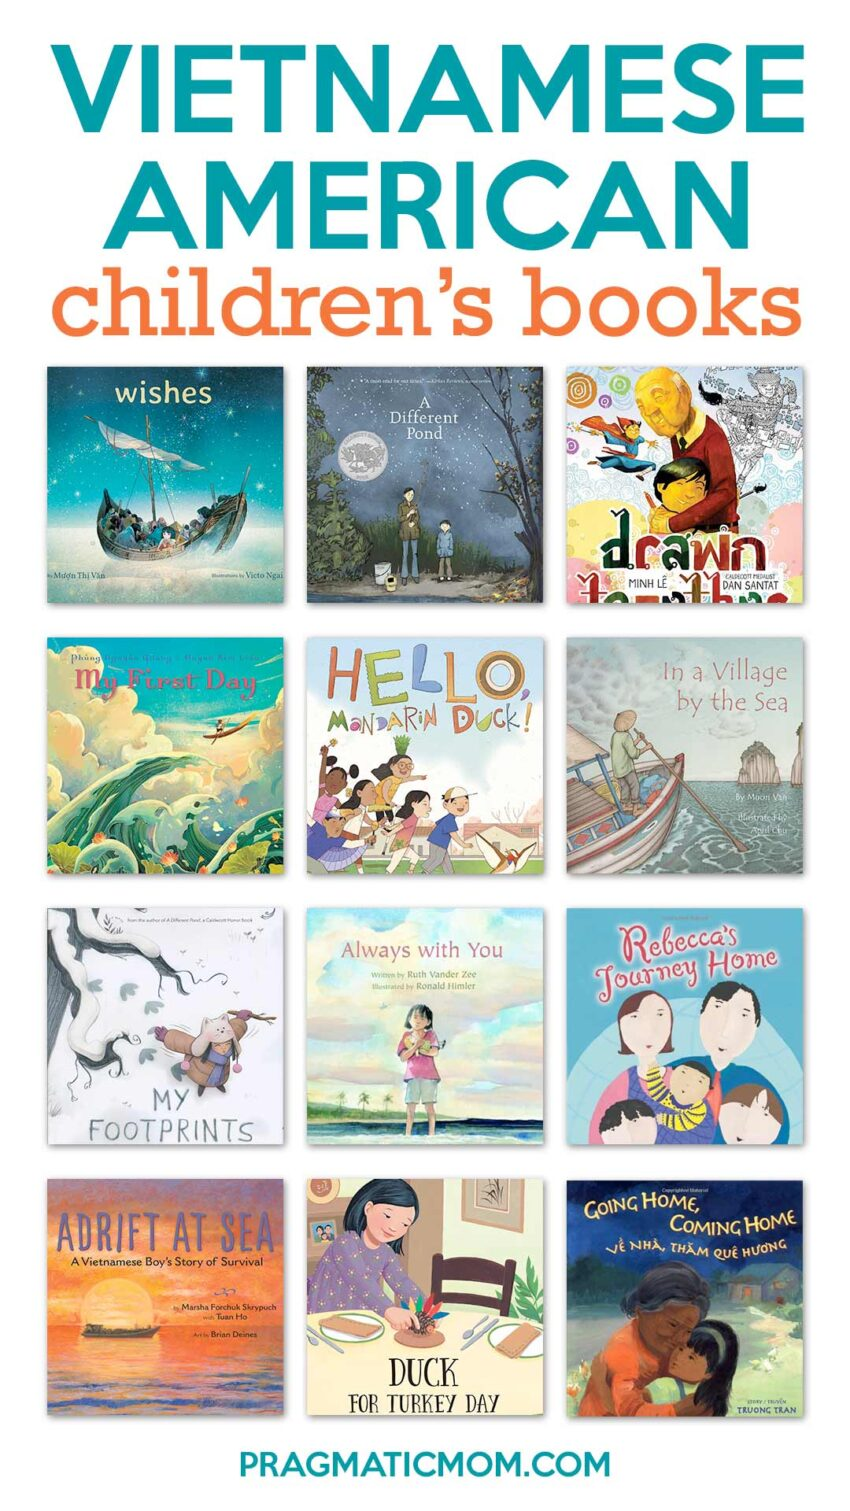 Vietnamese American Children's Books